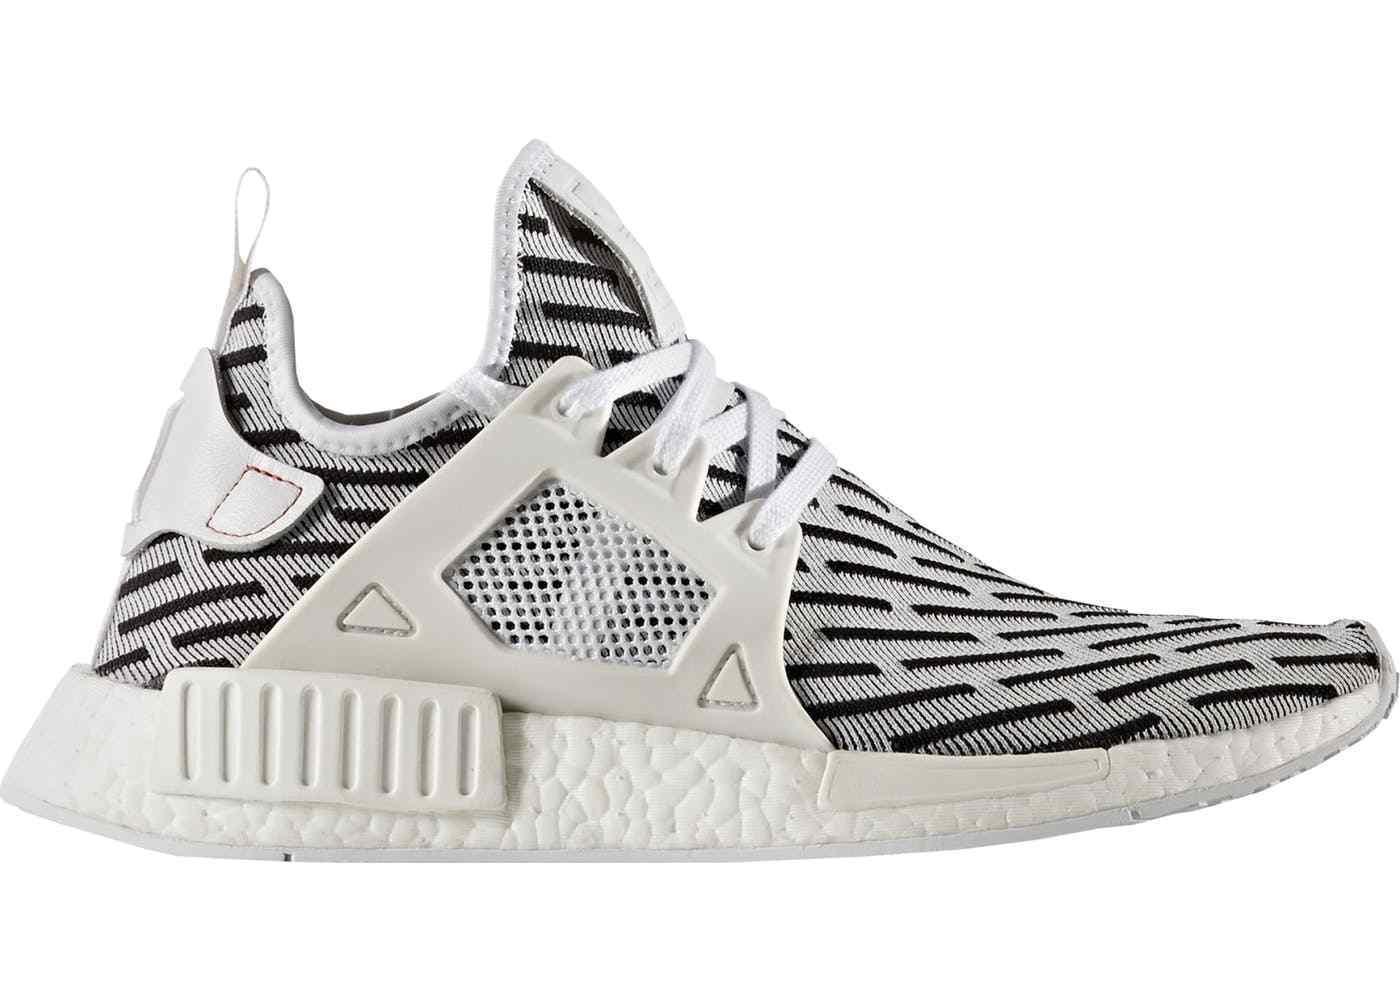 Adidas bb2911 nmd_xr1 PK primeknit Nomad Zebra blanco / negro bb2911 Adidas Talla 8 - 13 82ad6b